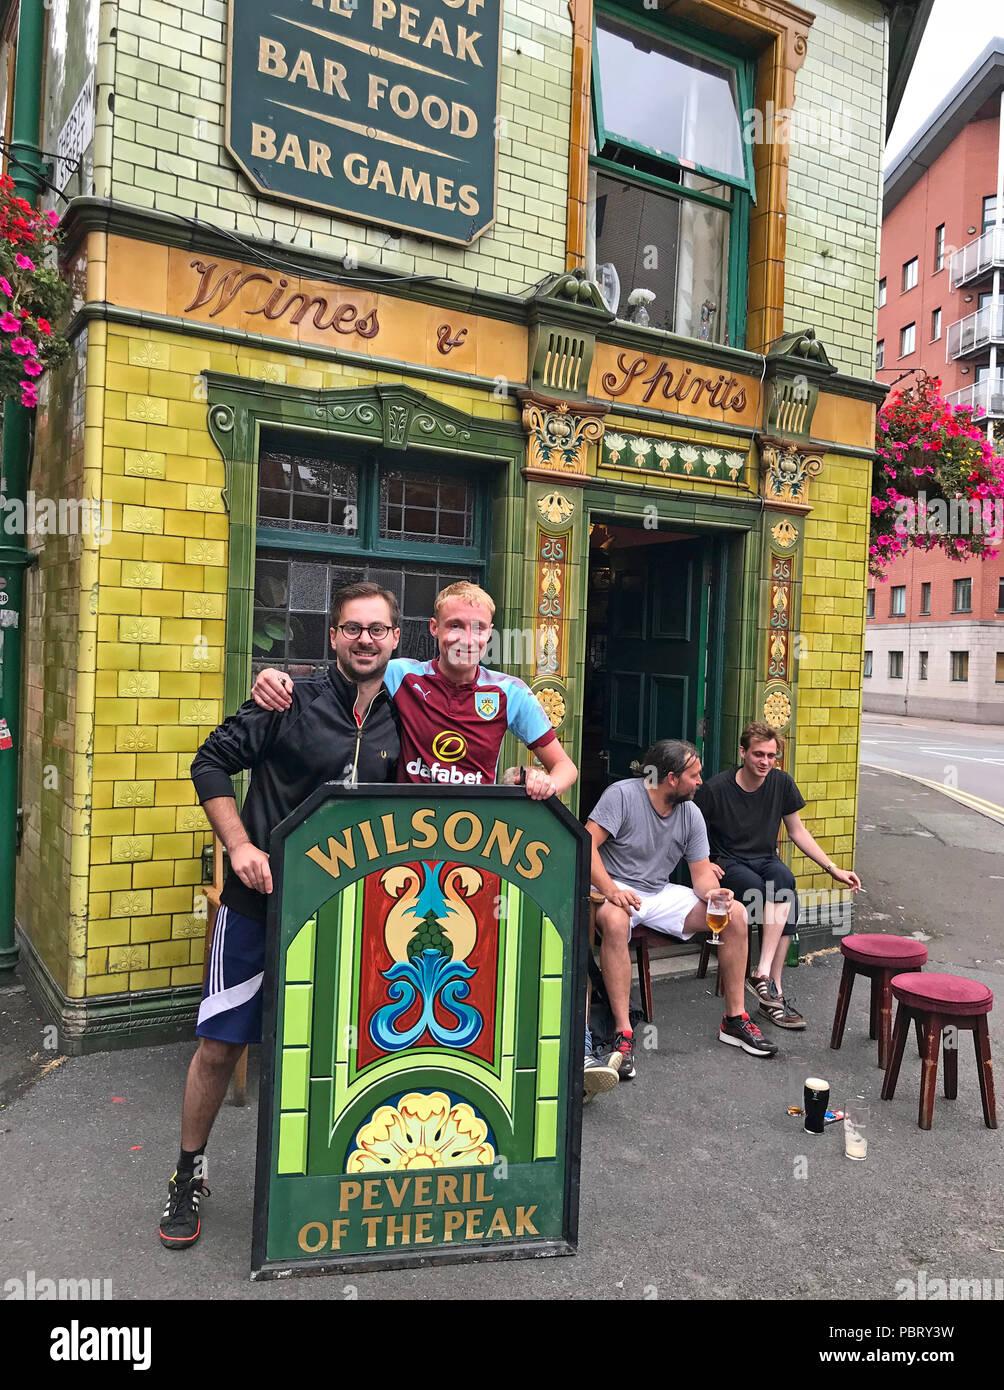 GoTonySmith,@HotpixUK,M1,pub,CAMRA,arrives,at,sign,painting,painted,Great